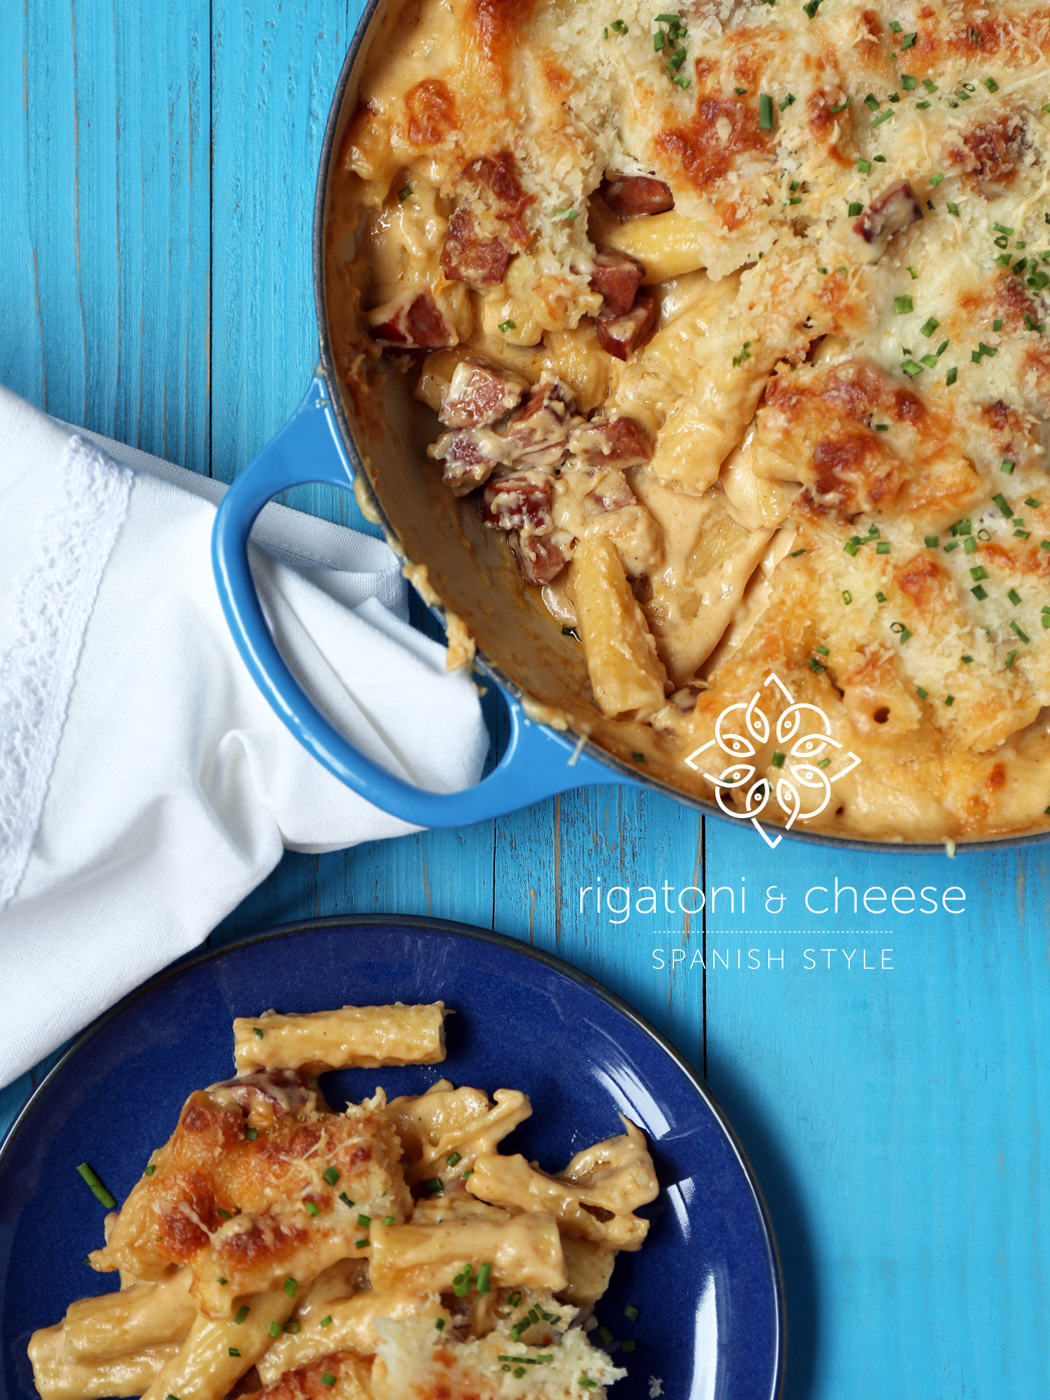 Rigatoni & Cheese Spanish Style